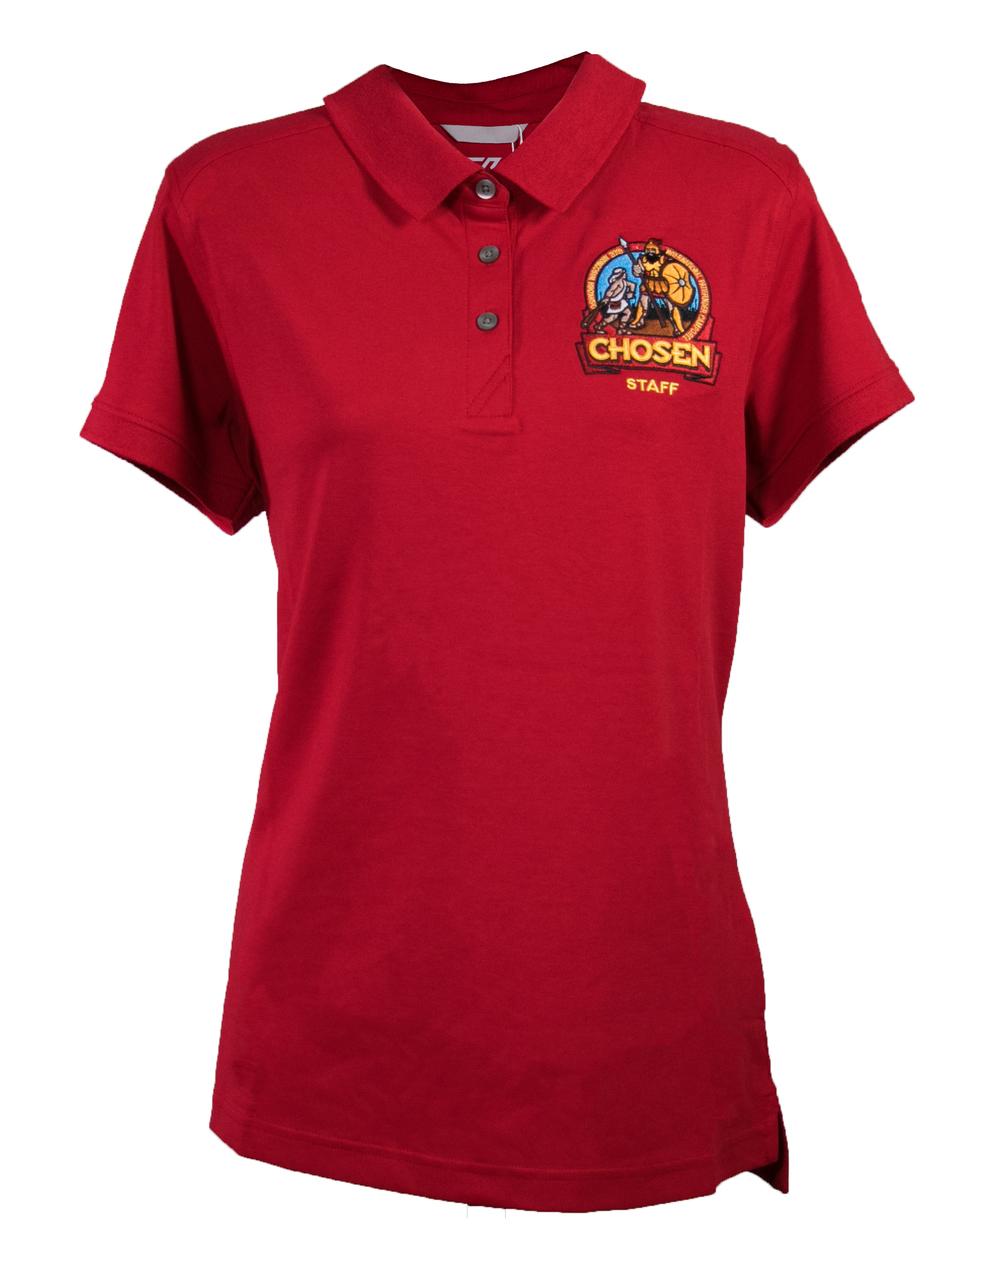 Chosen Women's Staff Polo - Red